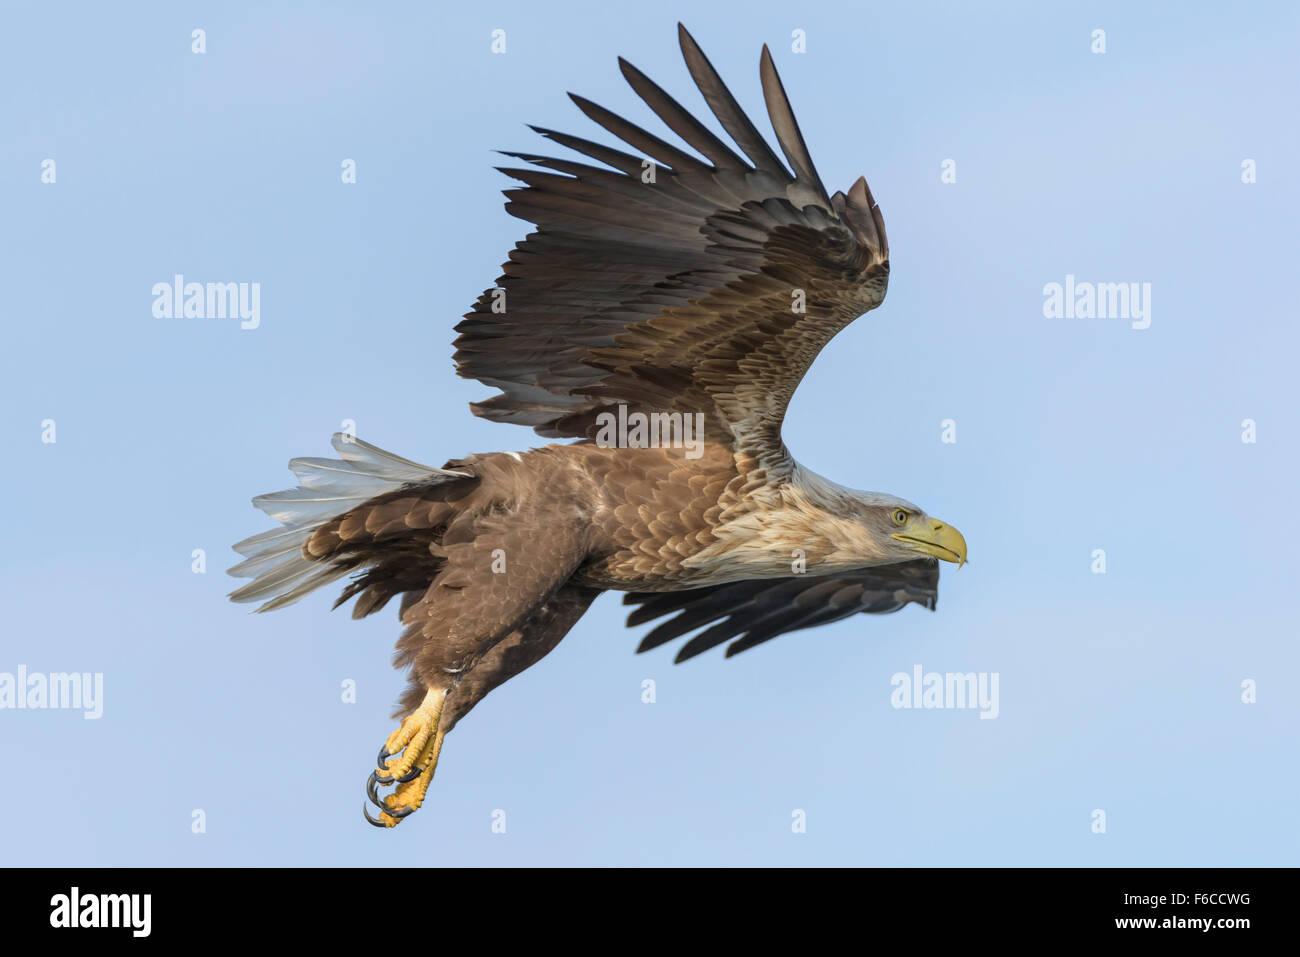 Seeadler, Haliaeetus albicilla, White Tailed Eagle Stock Photo